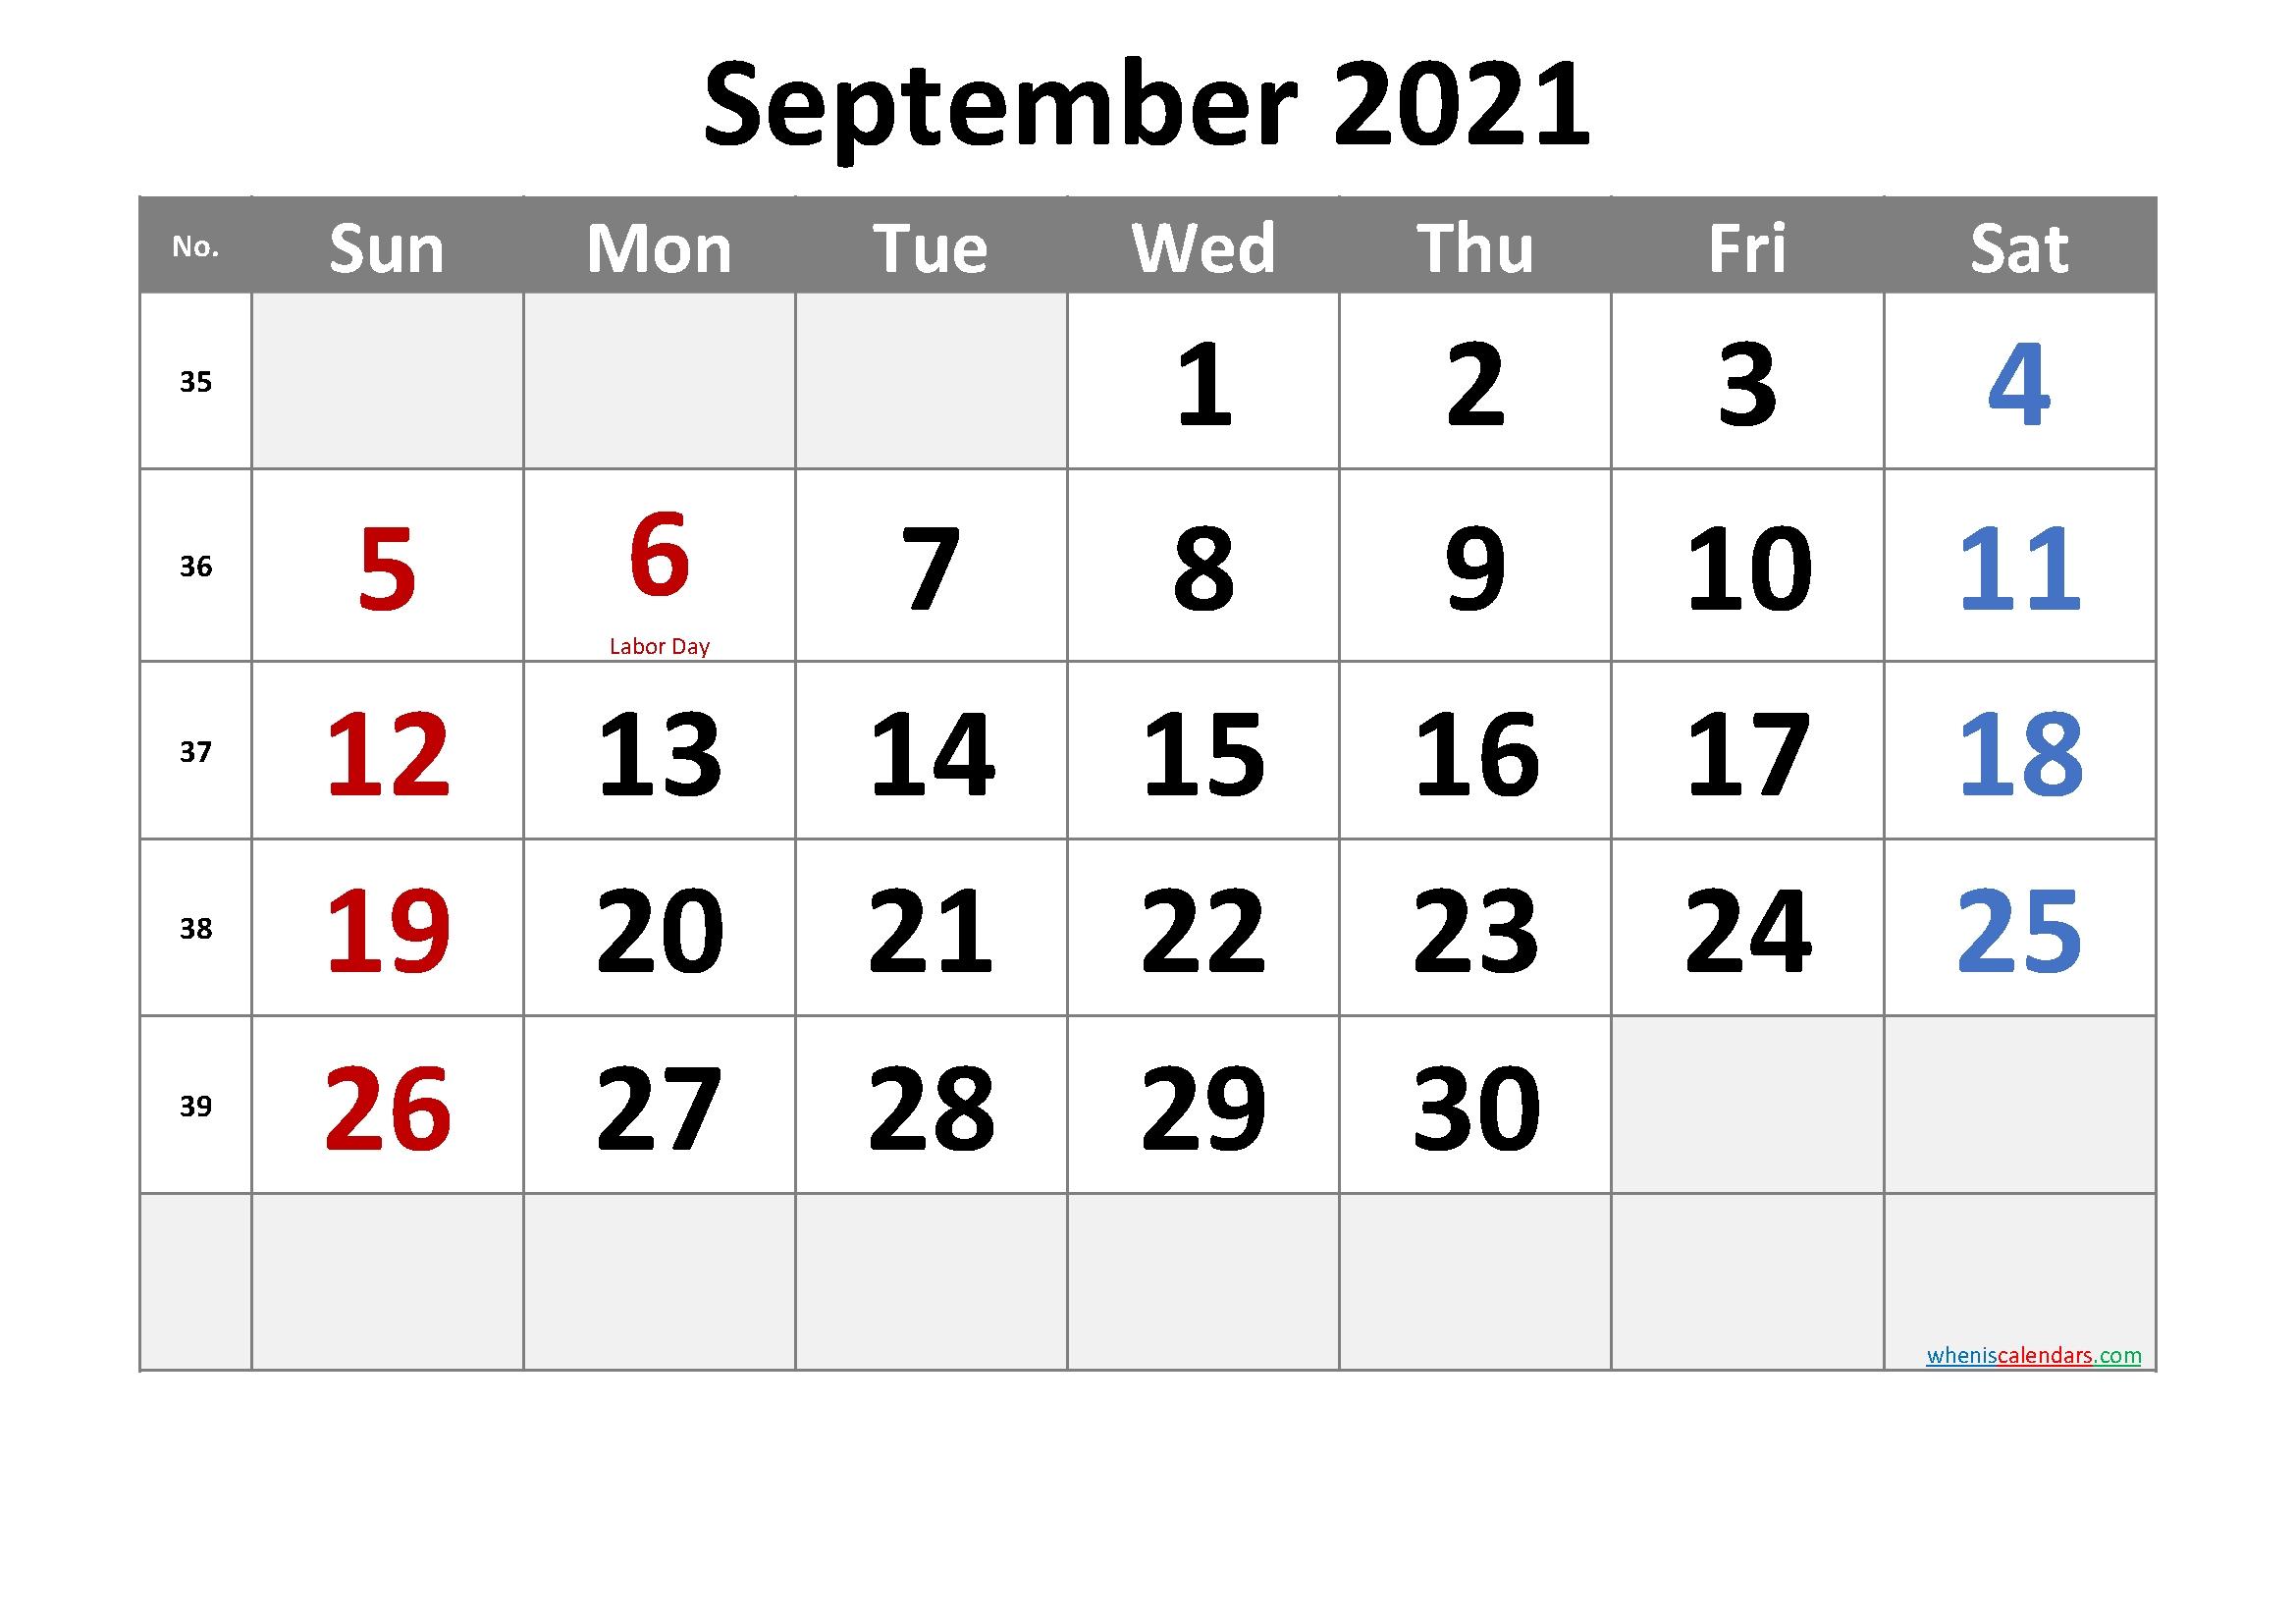 Free Printable September 2021 Calendar With Holidays September 2021 Calendar Template